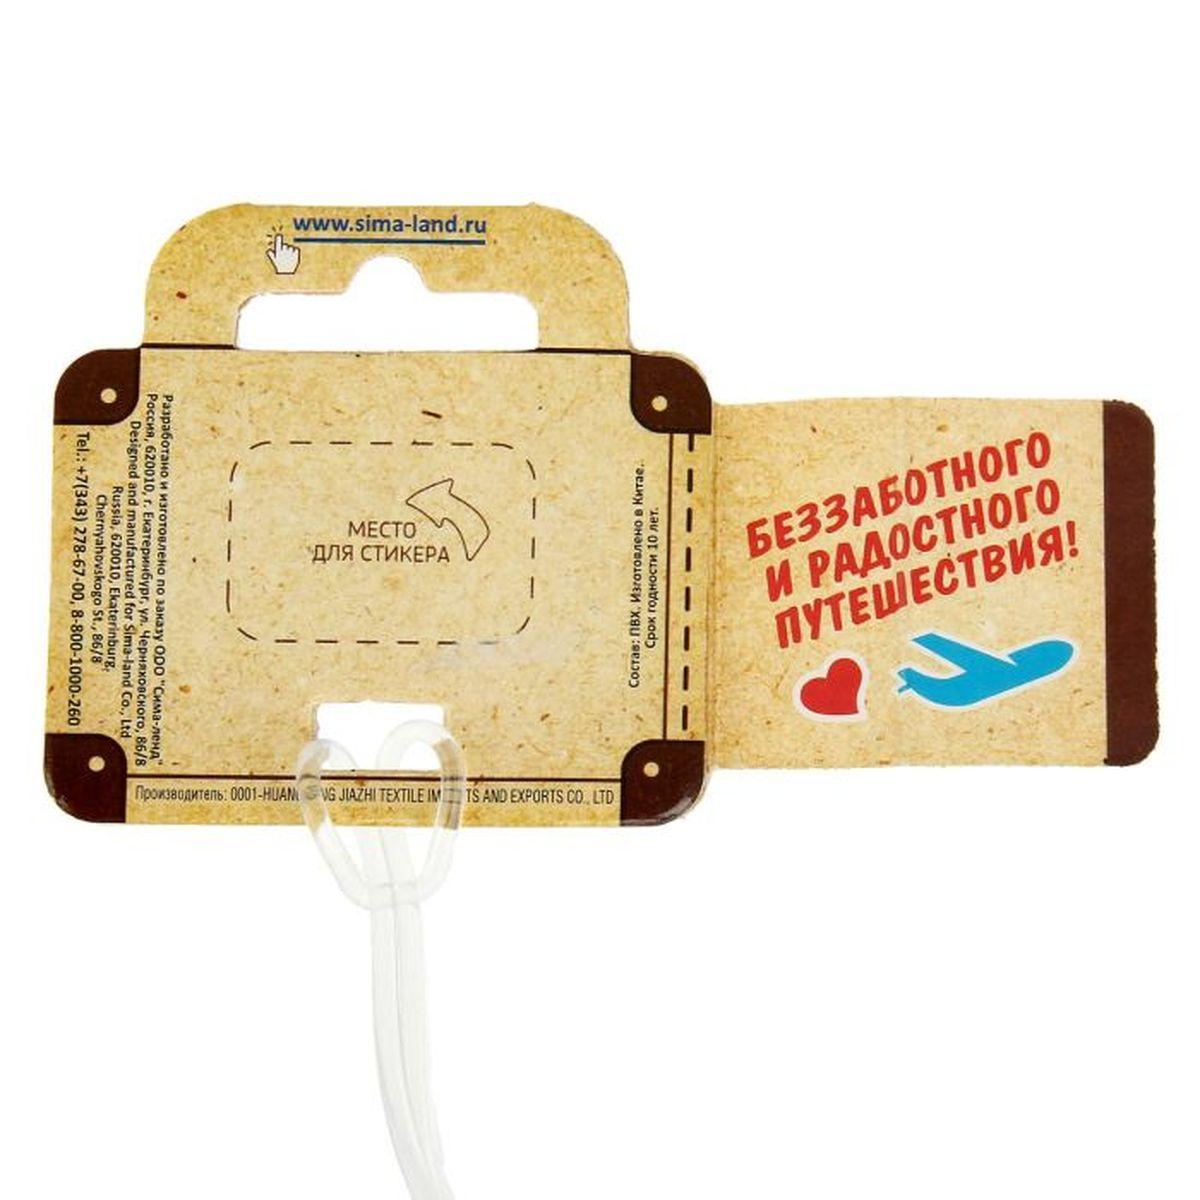 "Бирка на чемодан Sima-land ""Слава России"", 6,5 х 11 см. 1156280"